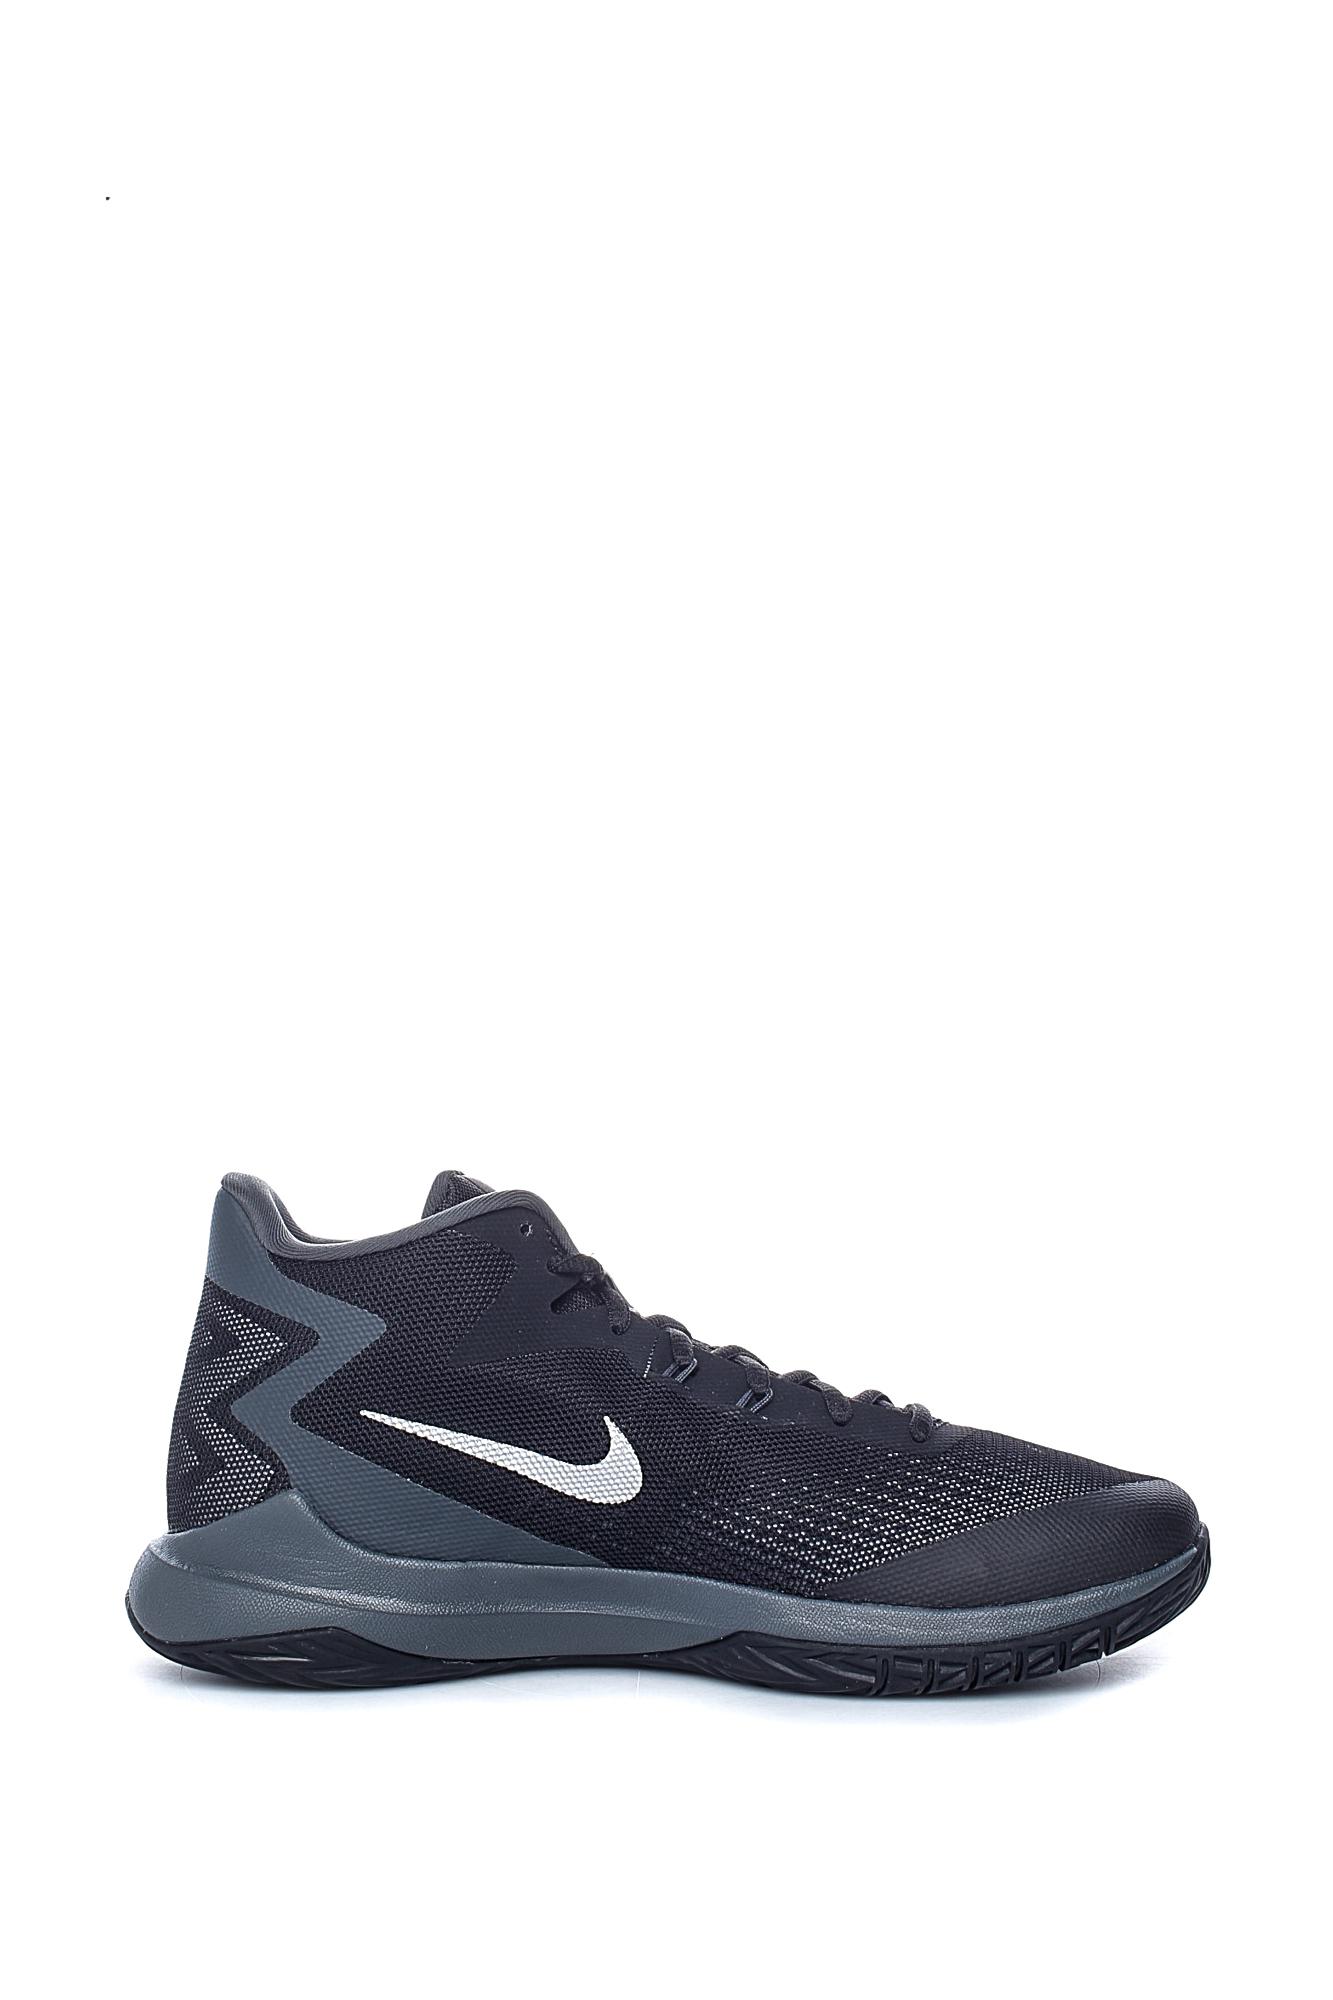 NIKE – Ανδρικά παπούτσια μπάσκετ Nike ZOOM EVIDENCE μαύρα